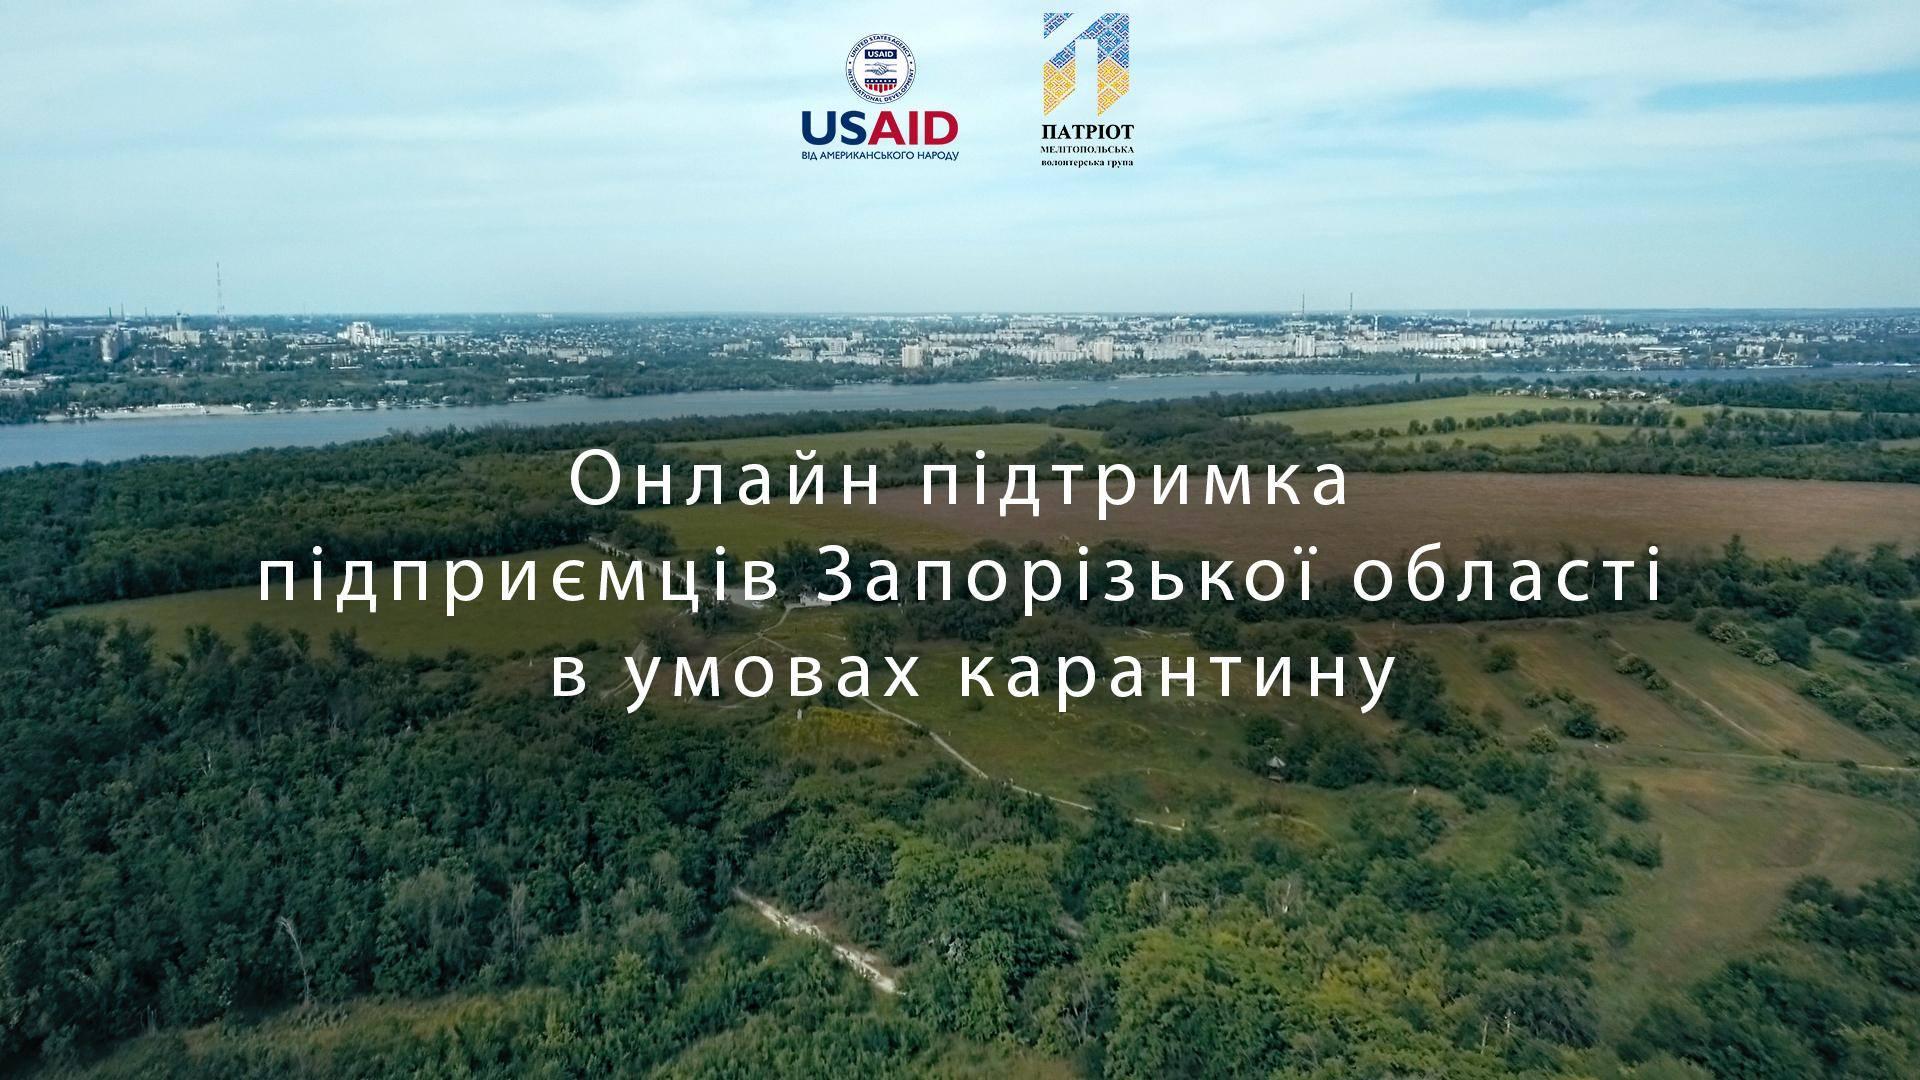 «Онлайн поддержка предпринимателей Запорожской области в условиях карантина»